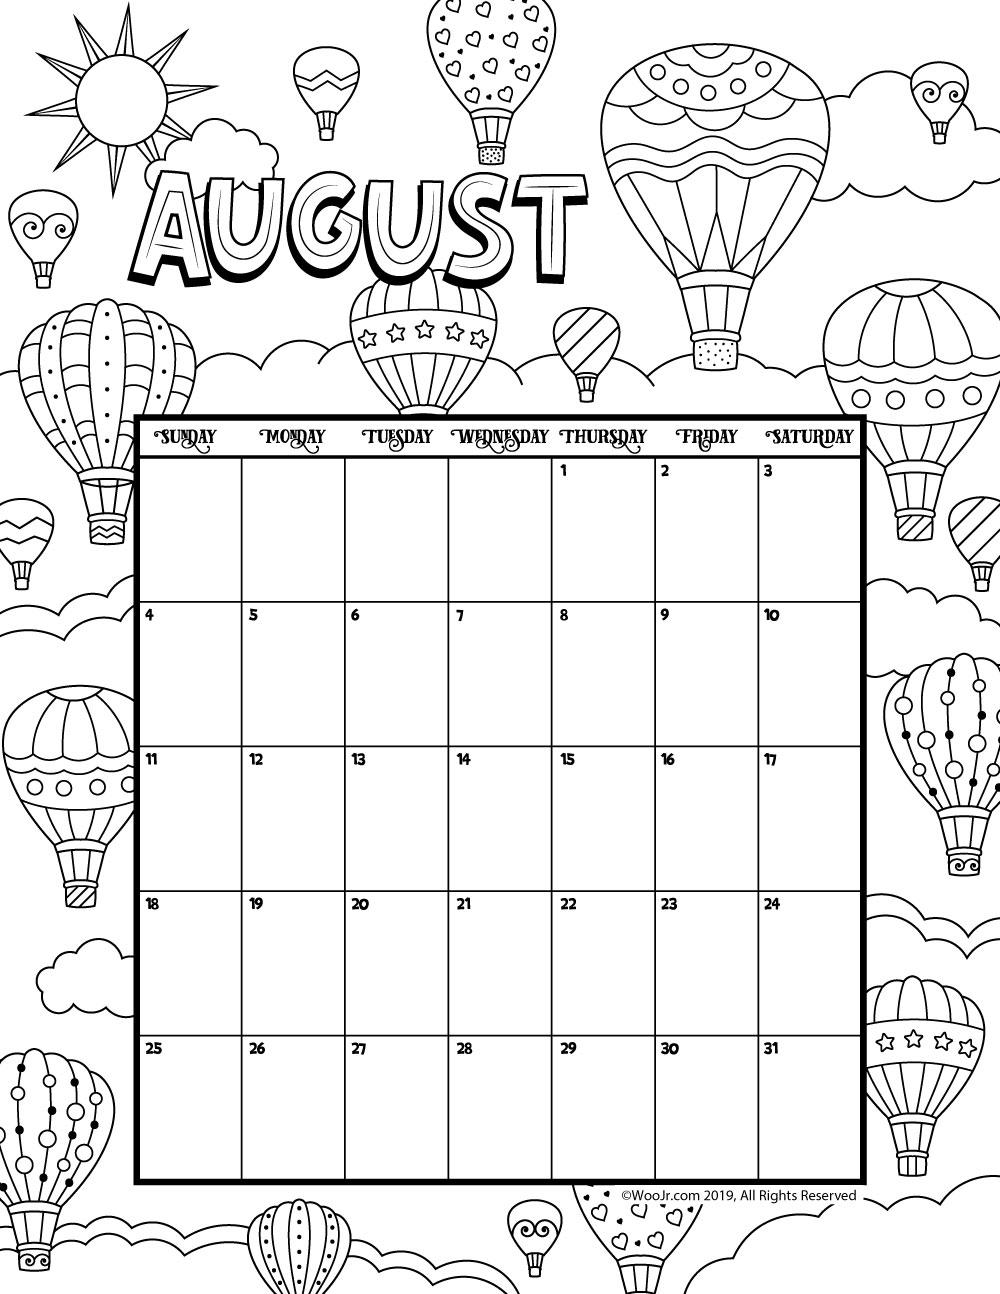 August 2019 Coloring Calendar